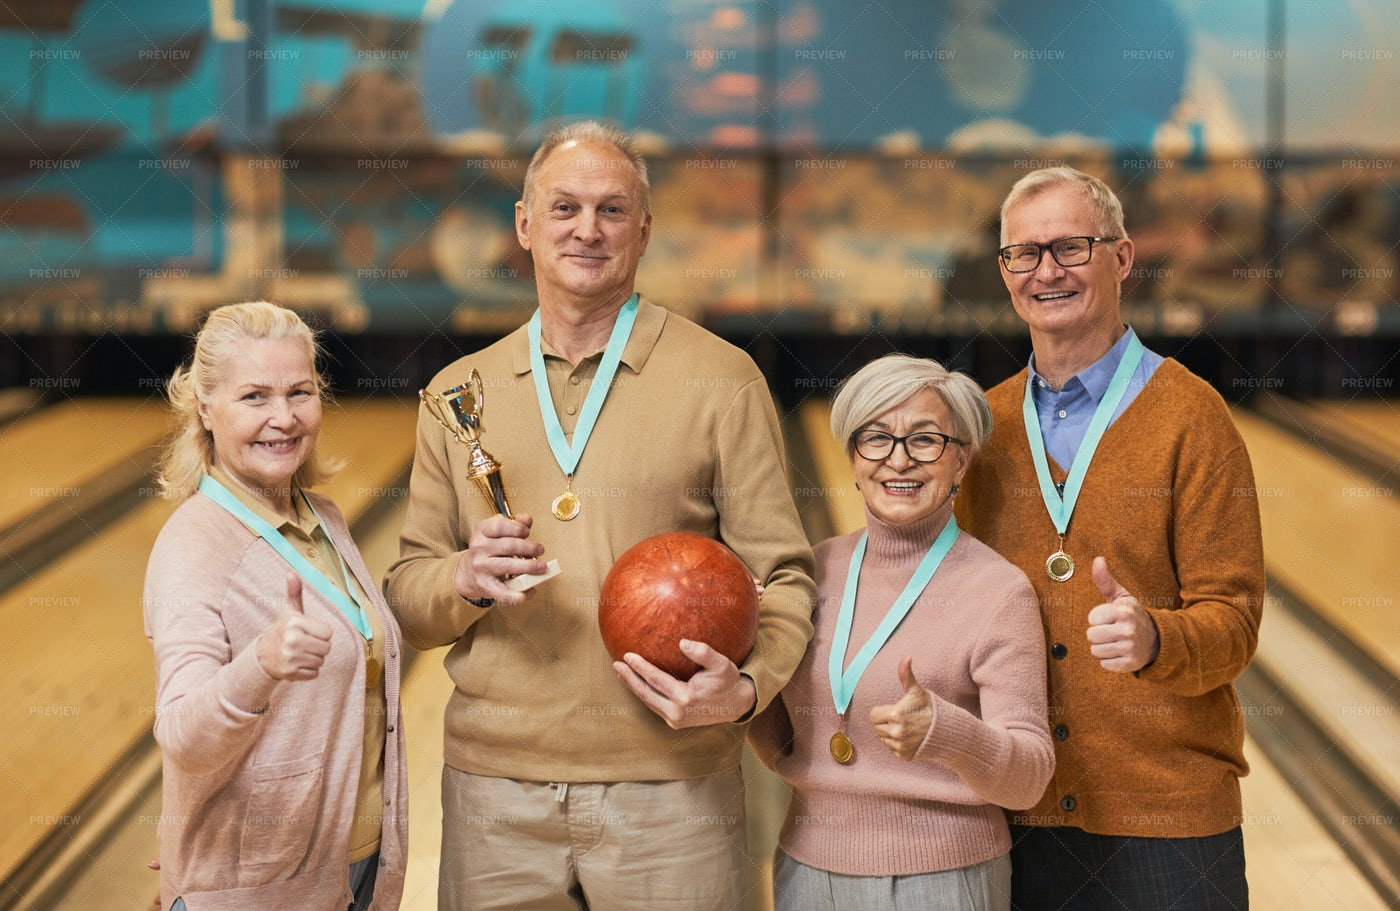 Senior Bowling Team: Stock Photos